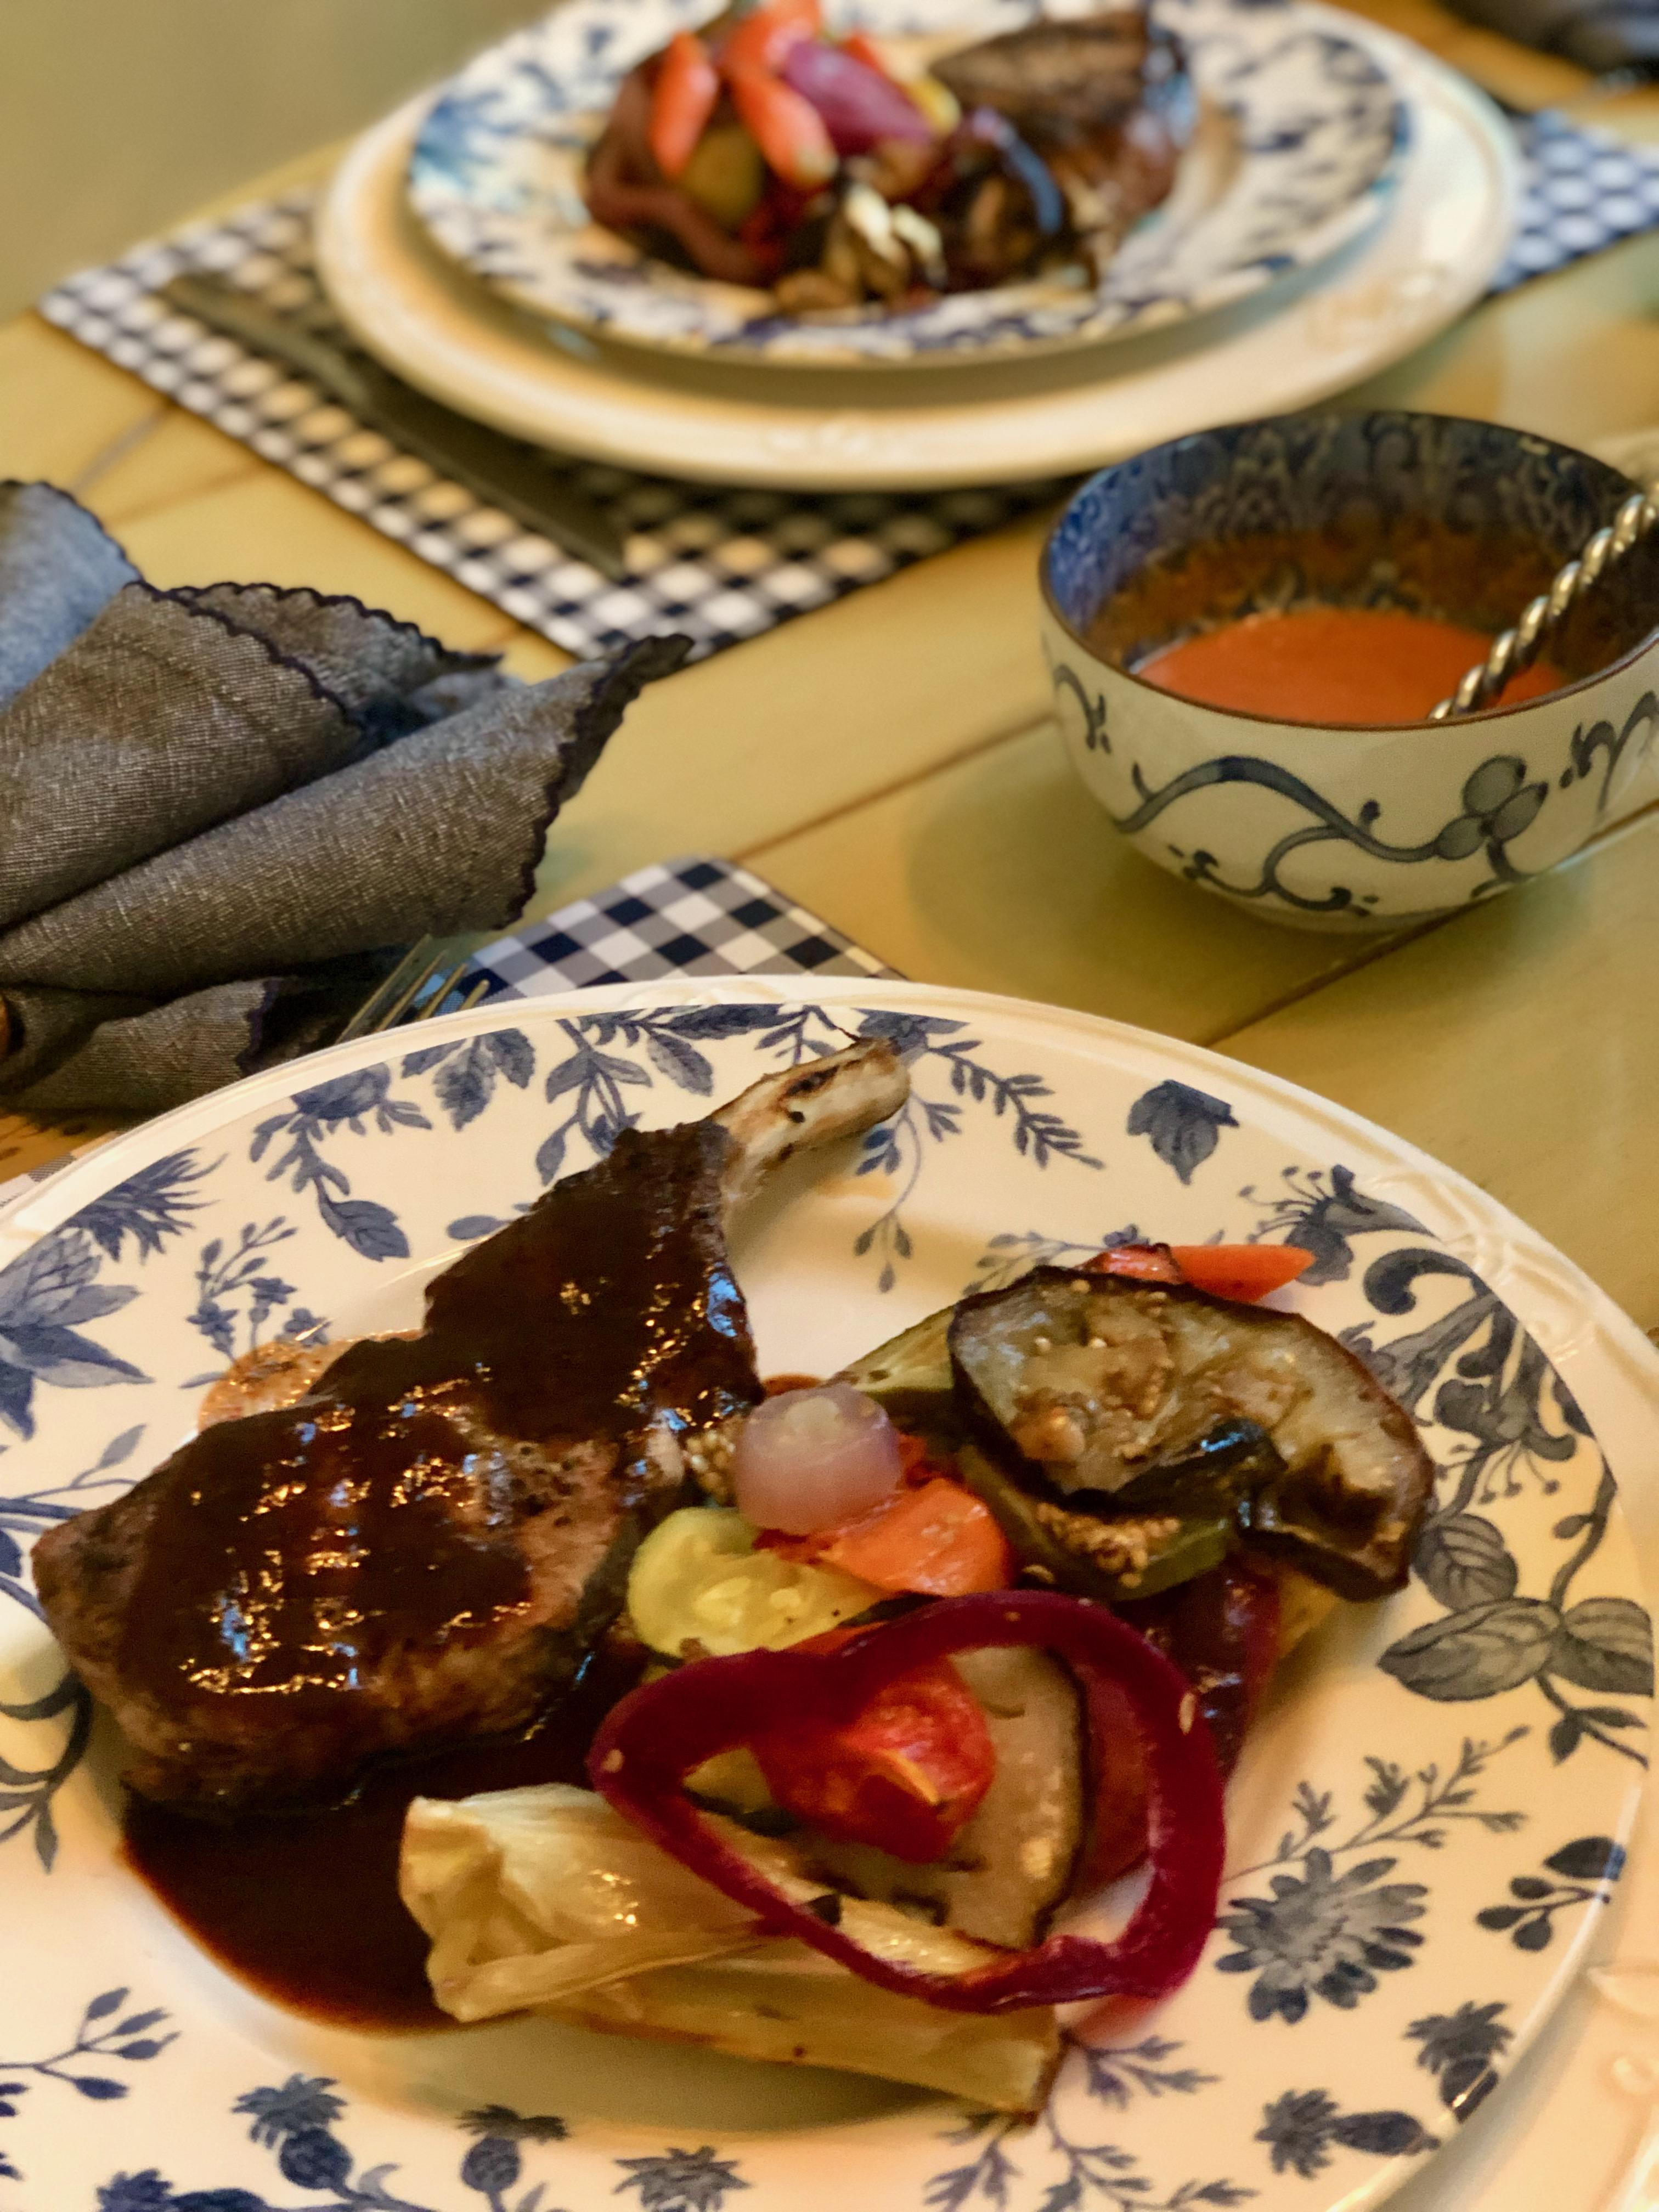 Mediterranean Vegetables With Grilled Pork Chops